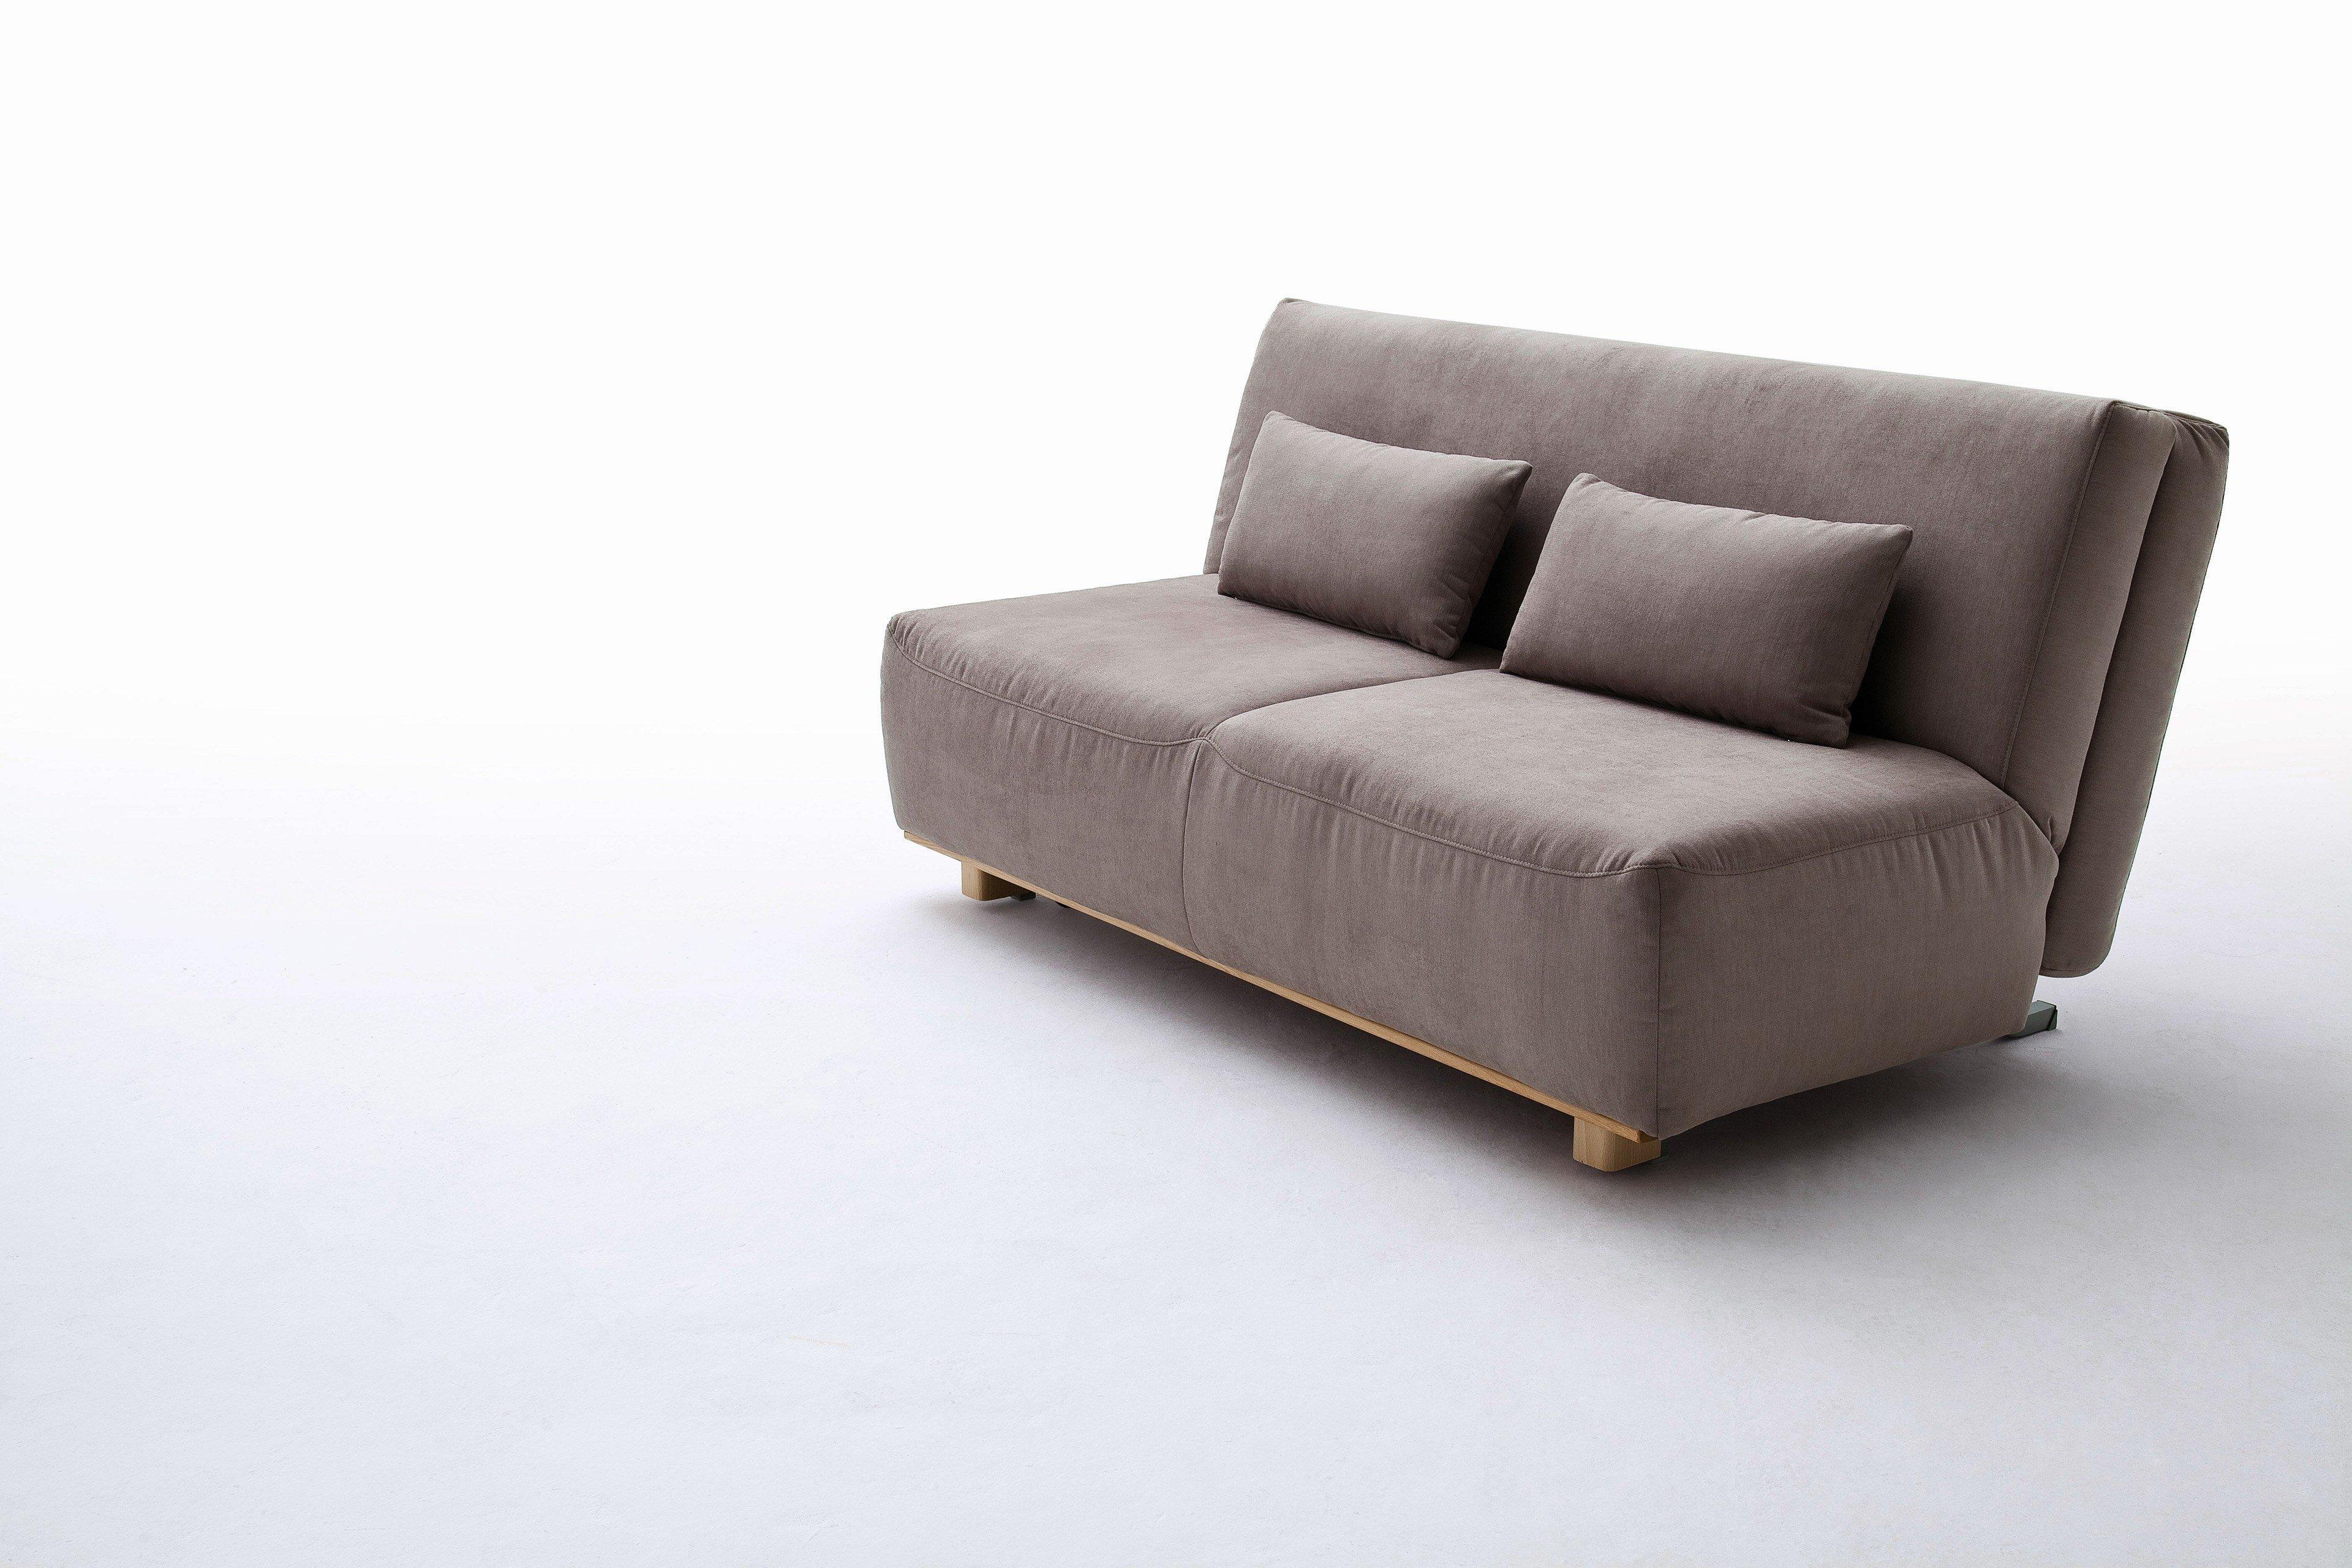 gnstige schlafsofas unter 100 euro schlafsofa stoffbezug terra ca x x cm with gnstige. Black Bedroom Furniture Sets. Home Design Ideas